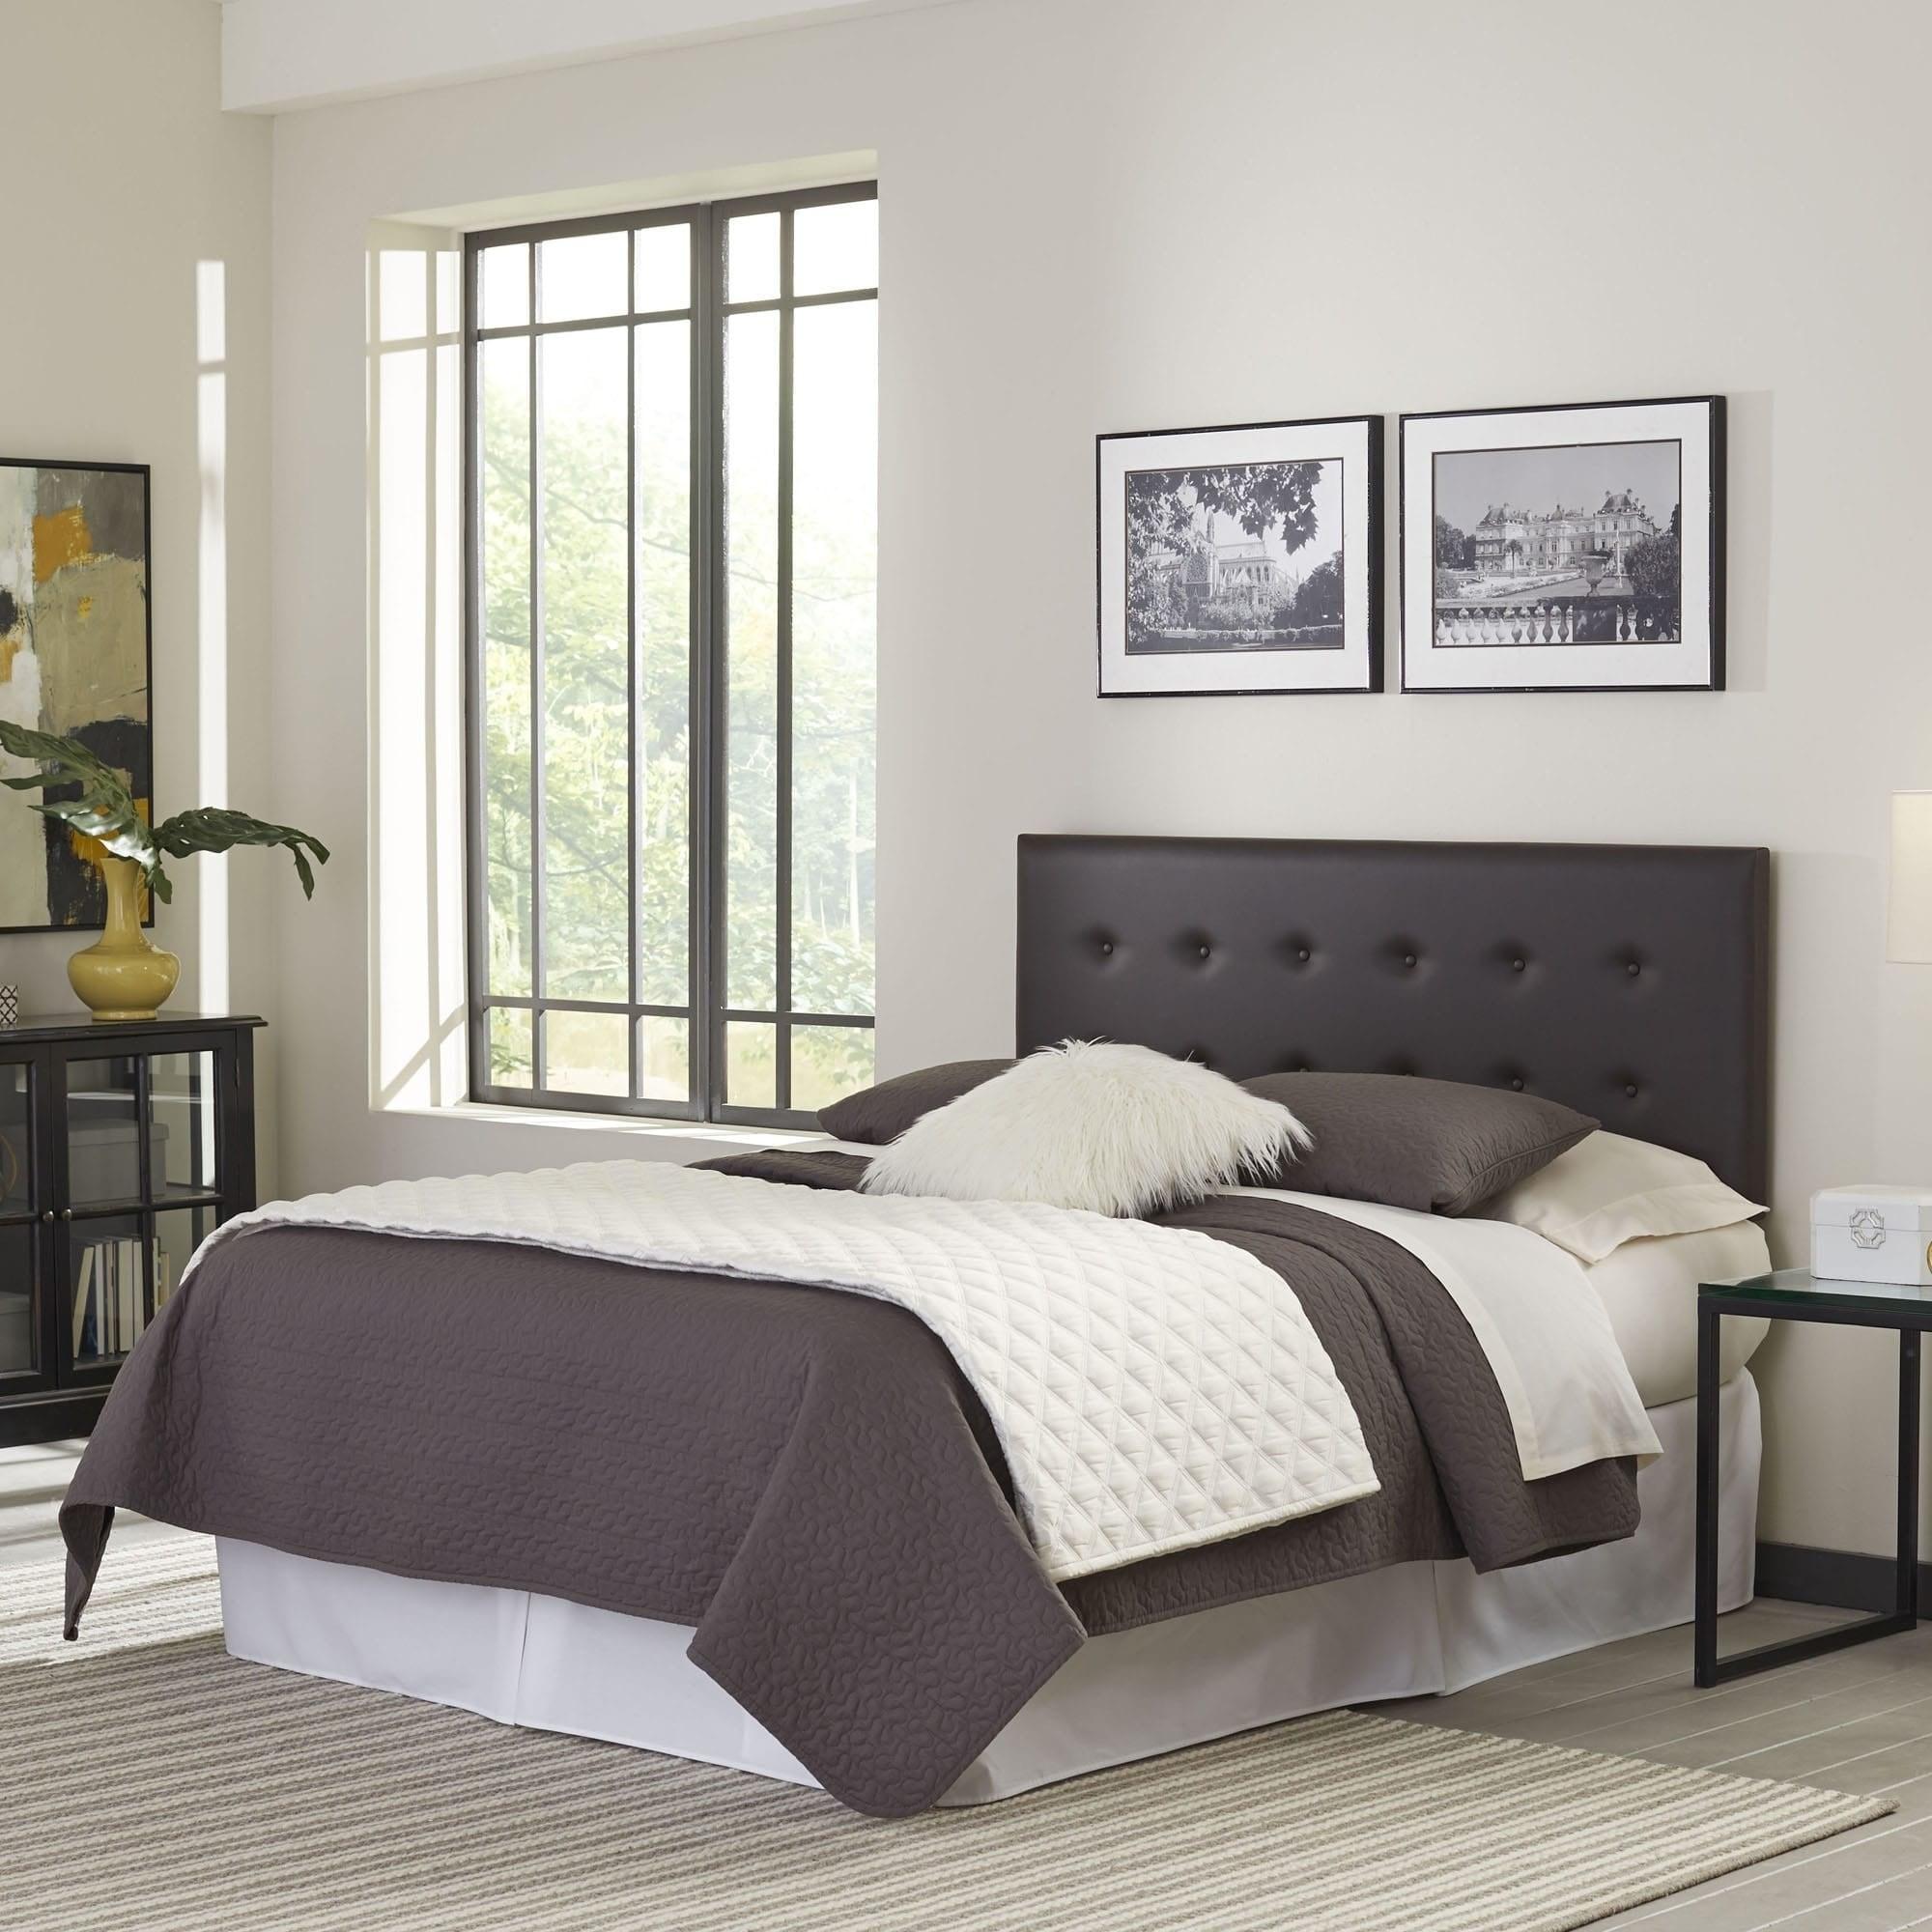 Fashion Bed Group Franklin Adjustable Headboard Panel wit...